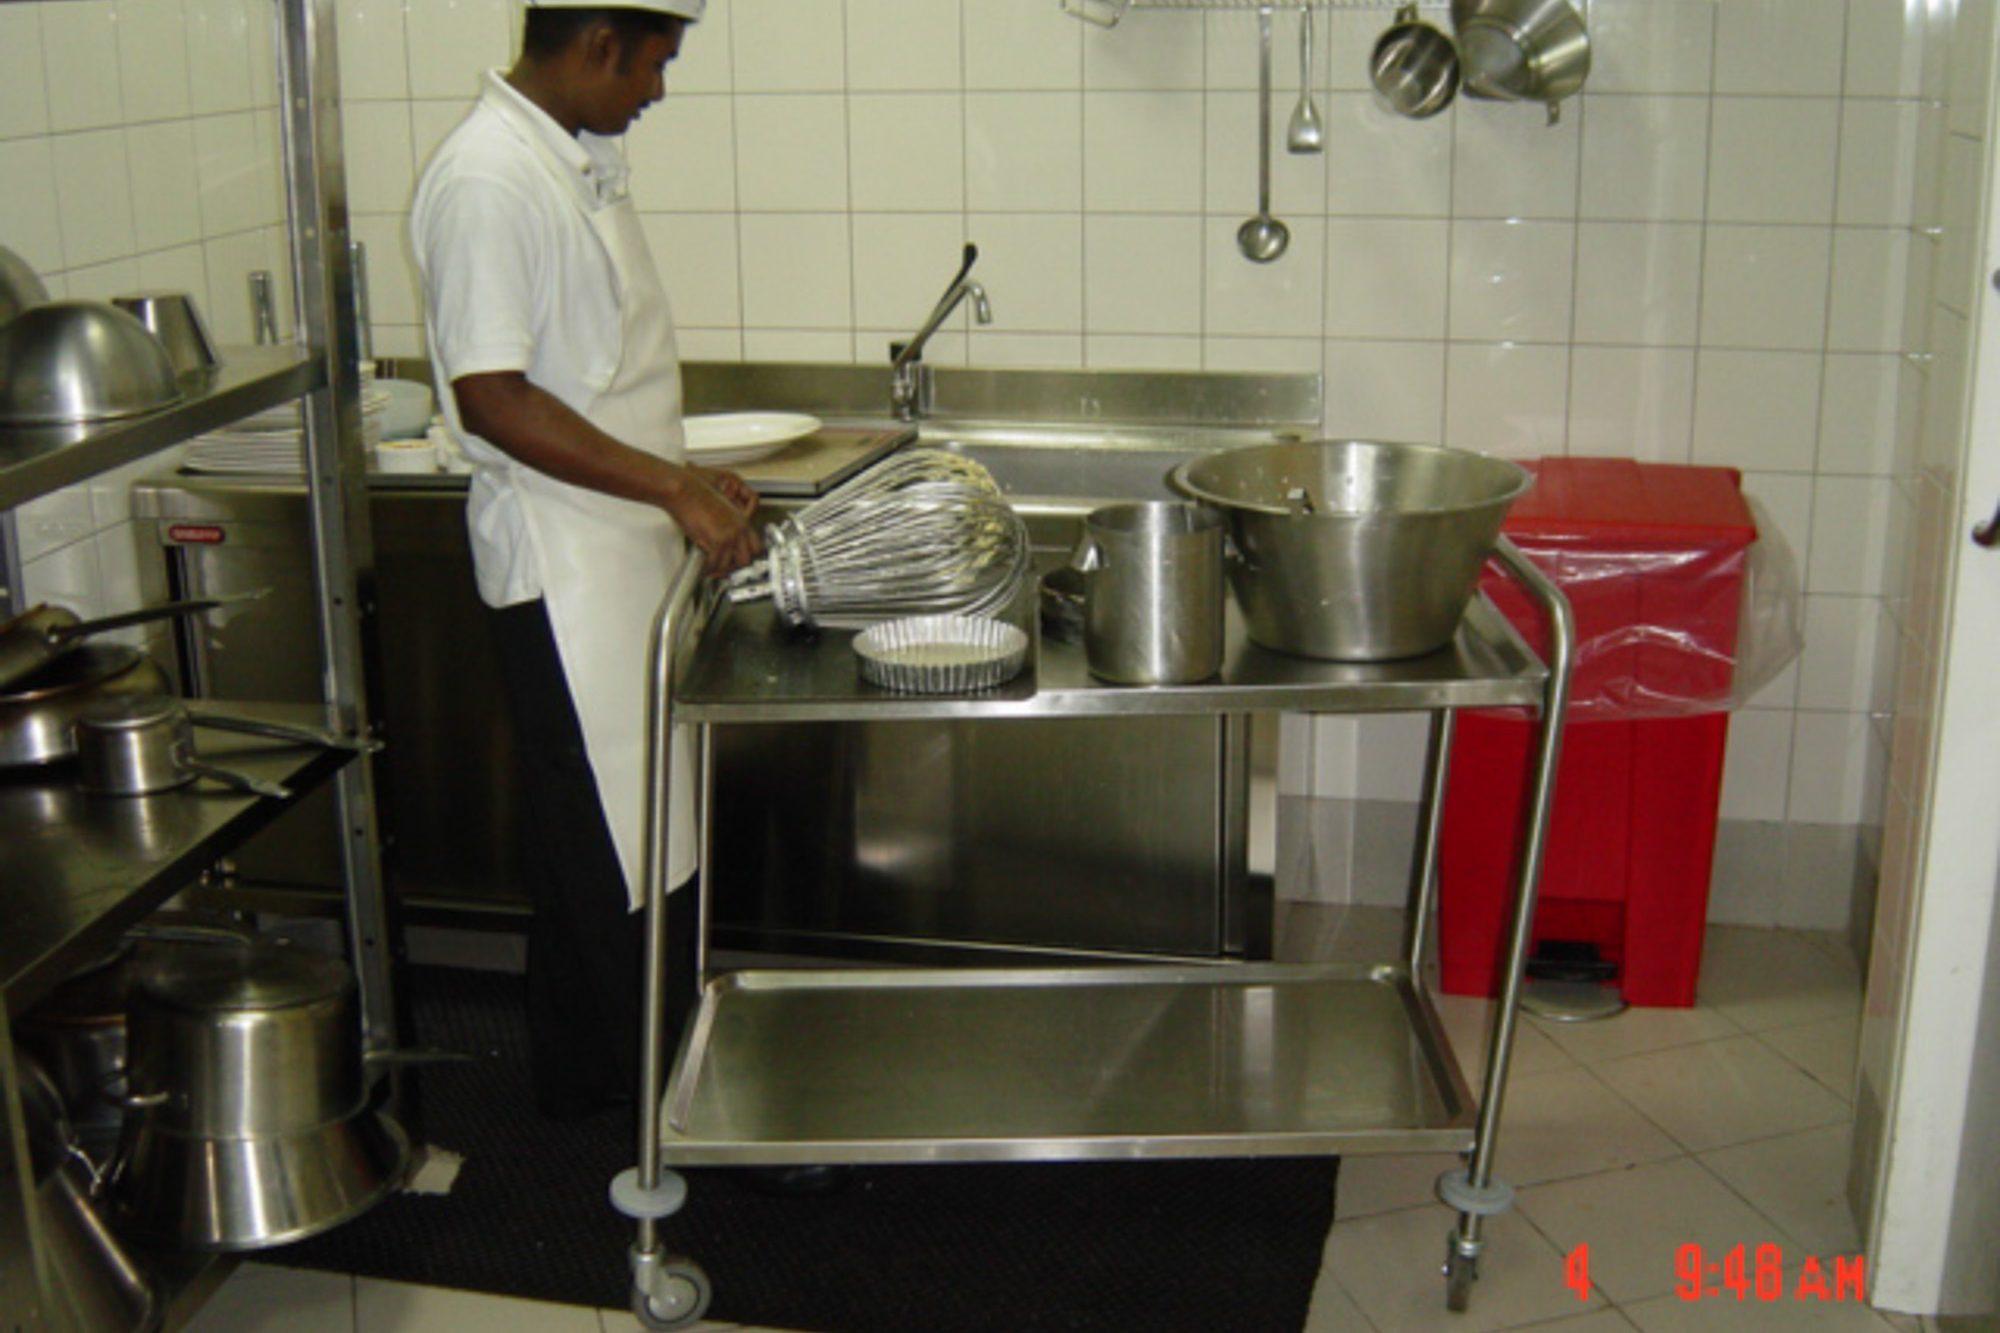 Italia_kitchen_-le_meridien_f-11